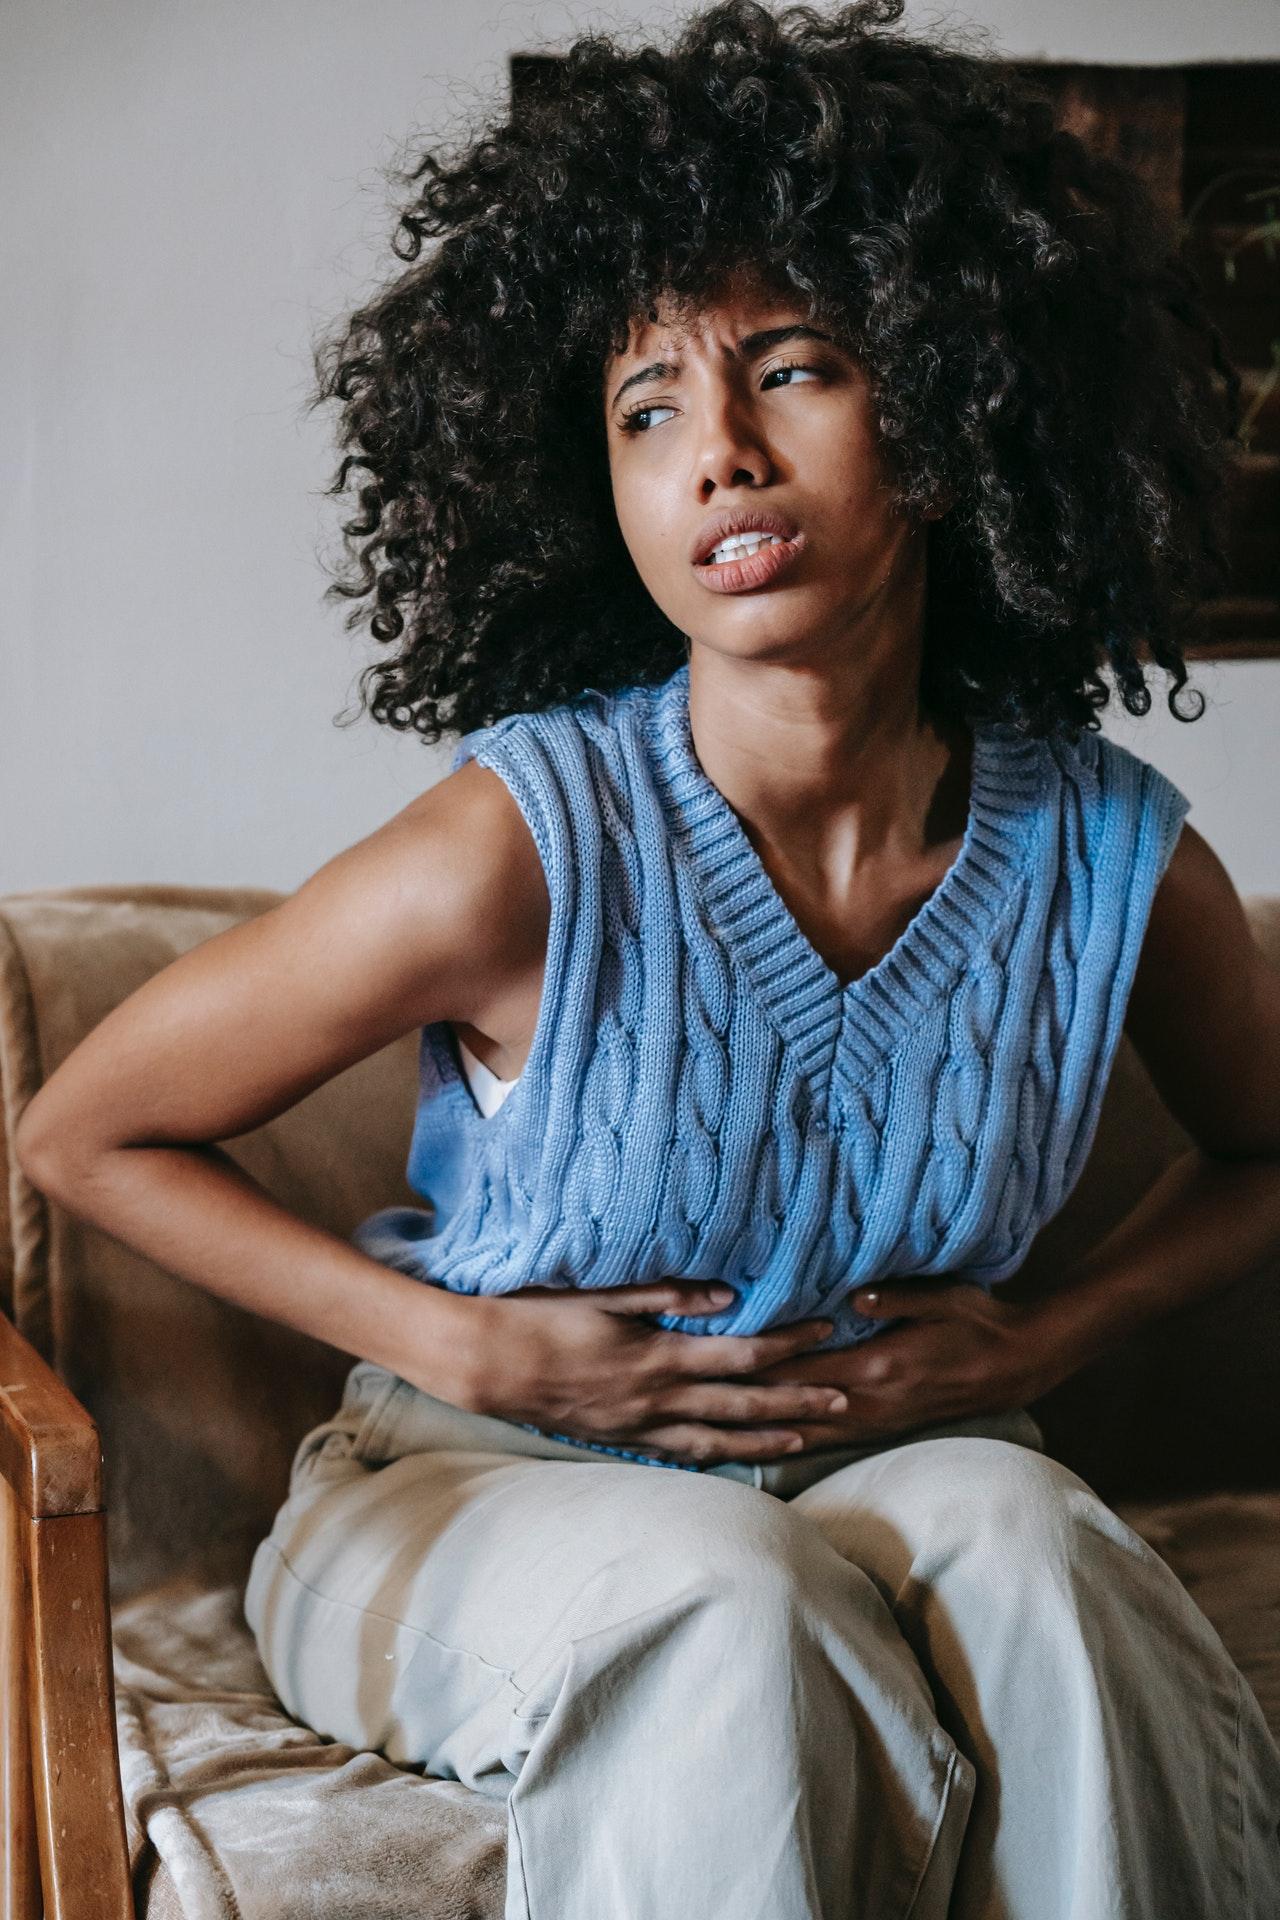 Why You Should Seek Treatment for Endometriosis